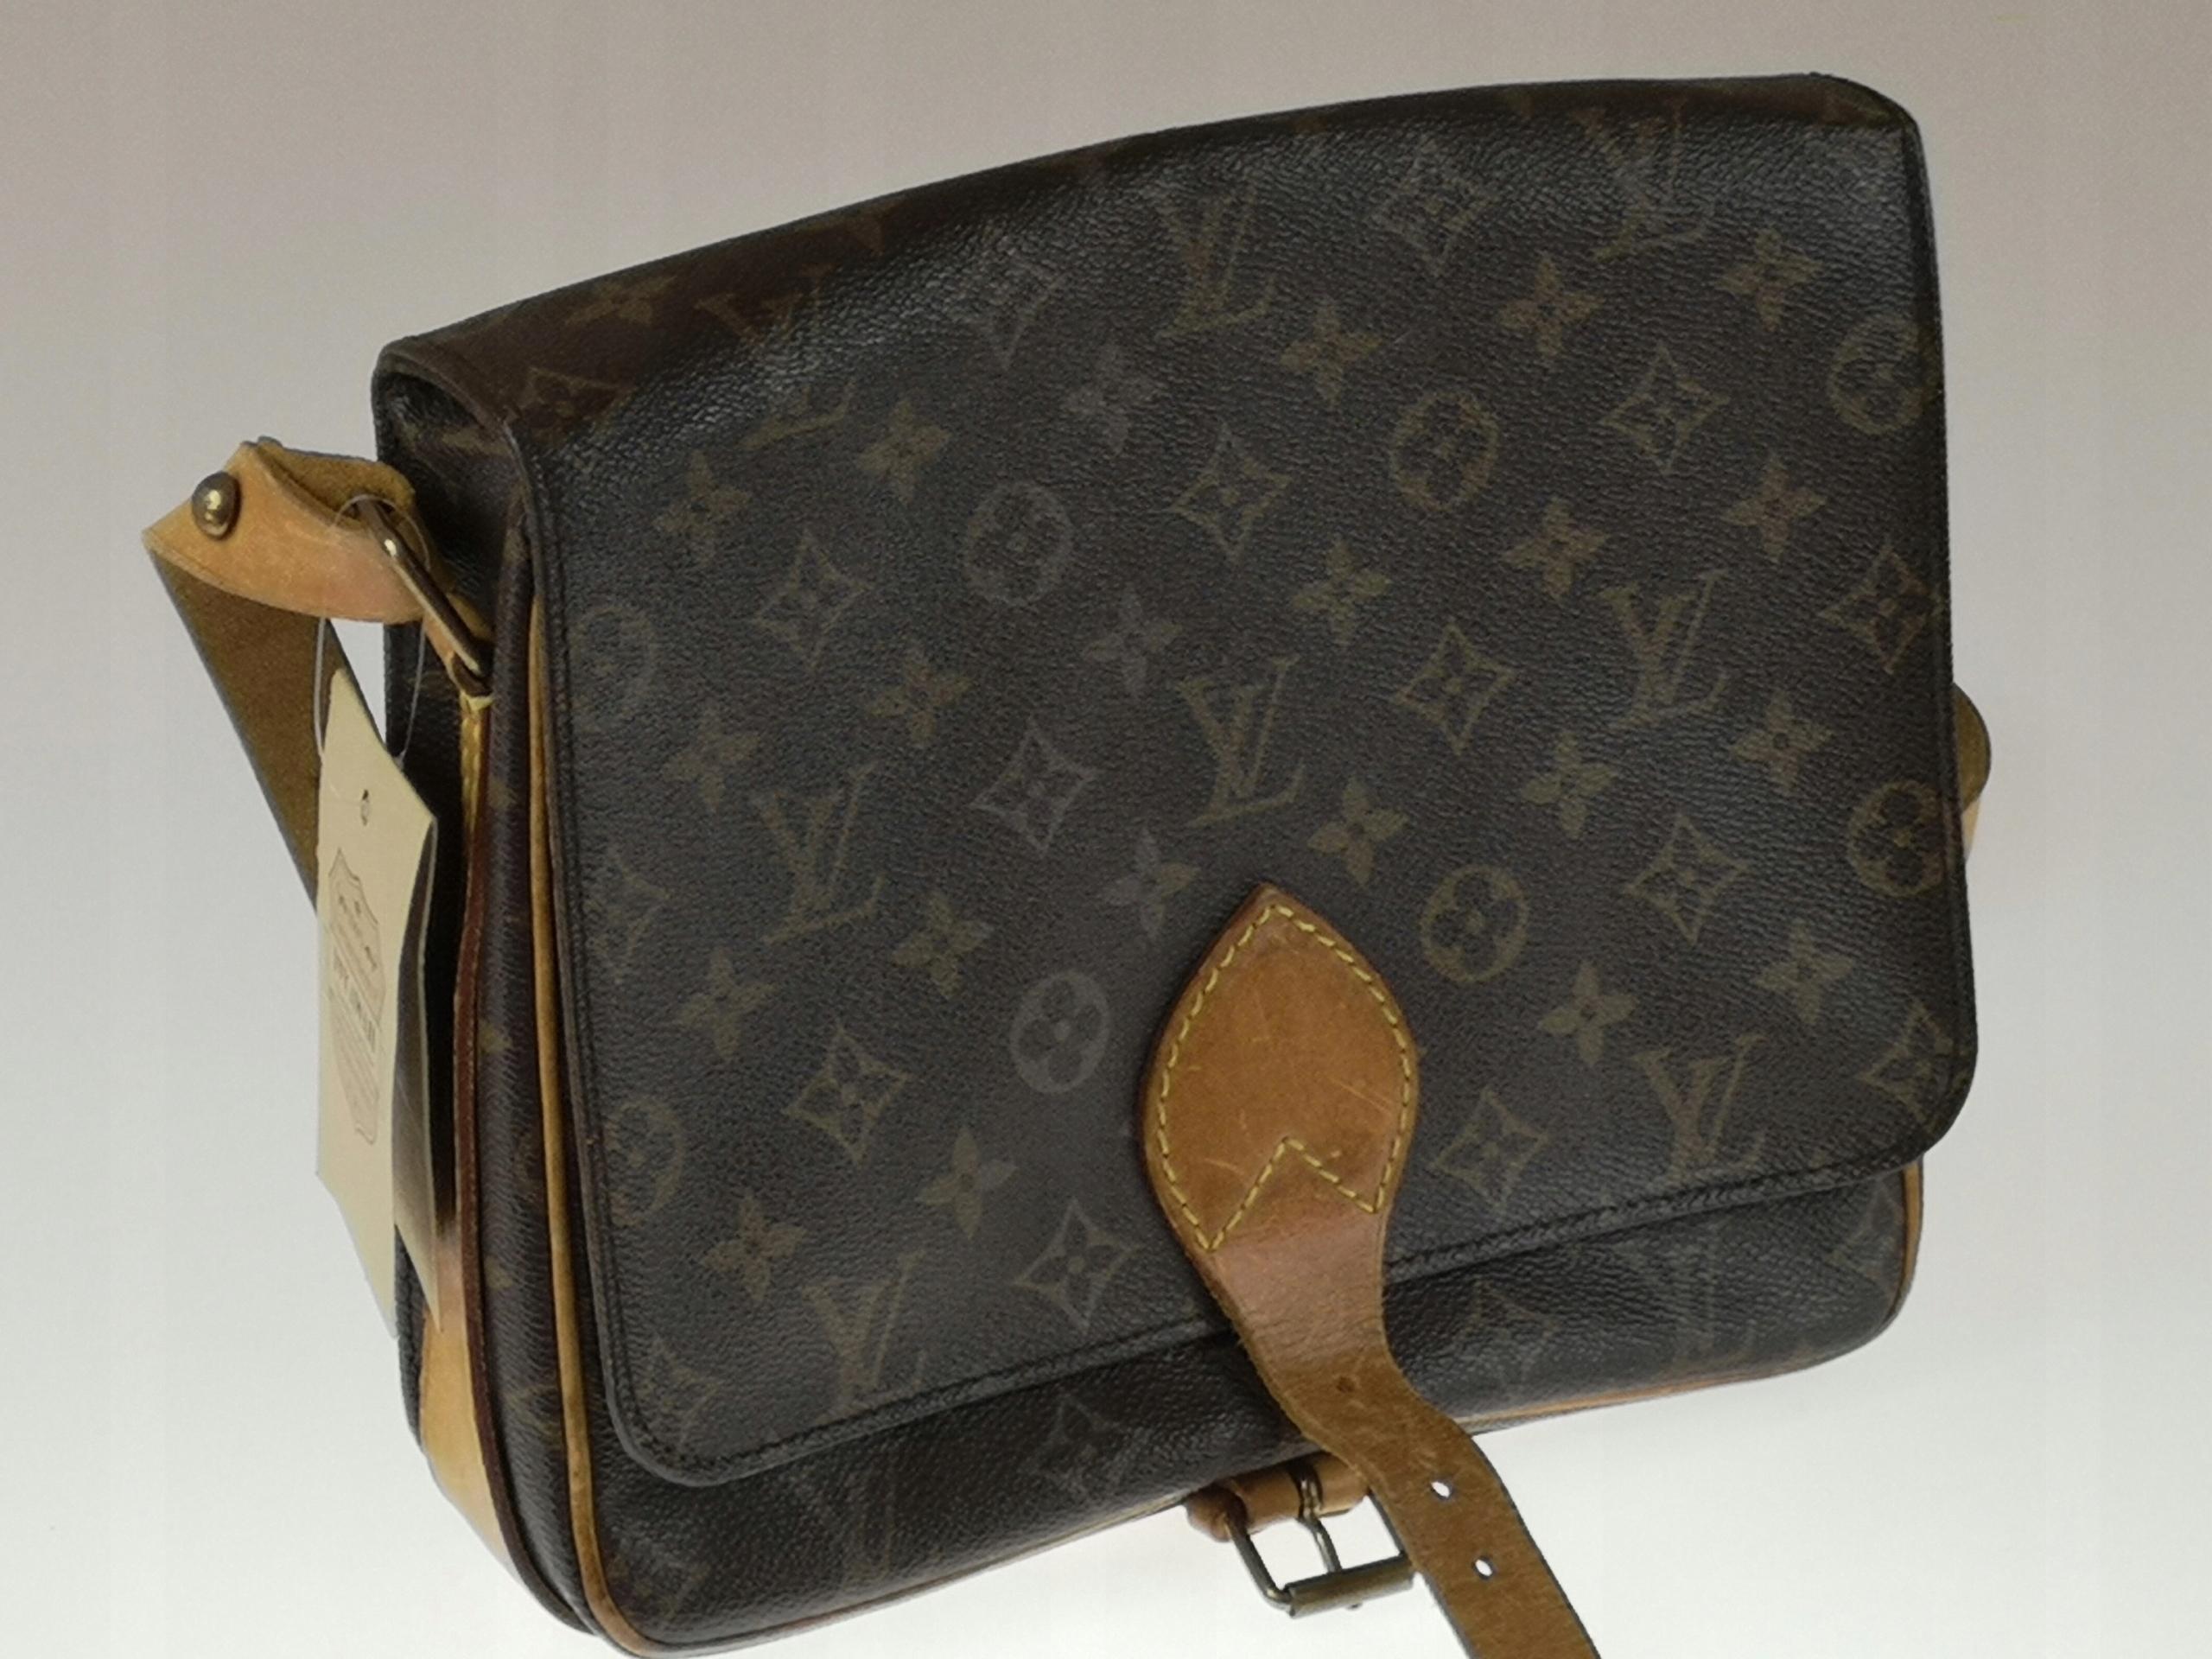 1f951aa7c9b55 Louis Vuitton torebka używana orginalna - 7540147542 - oficjalne ...